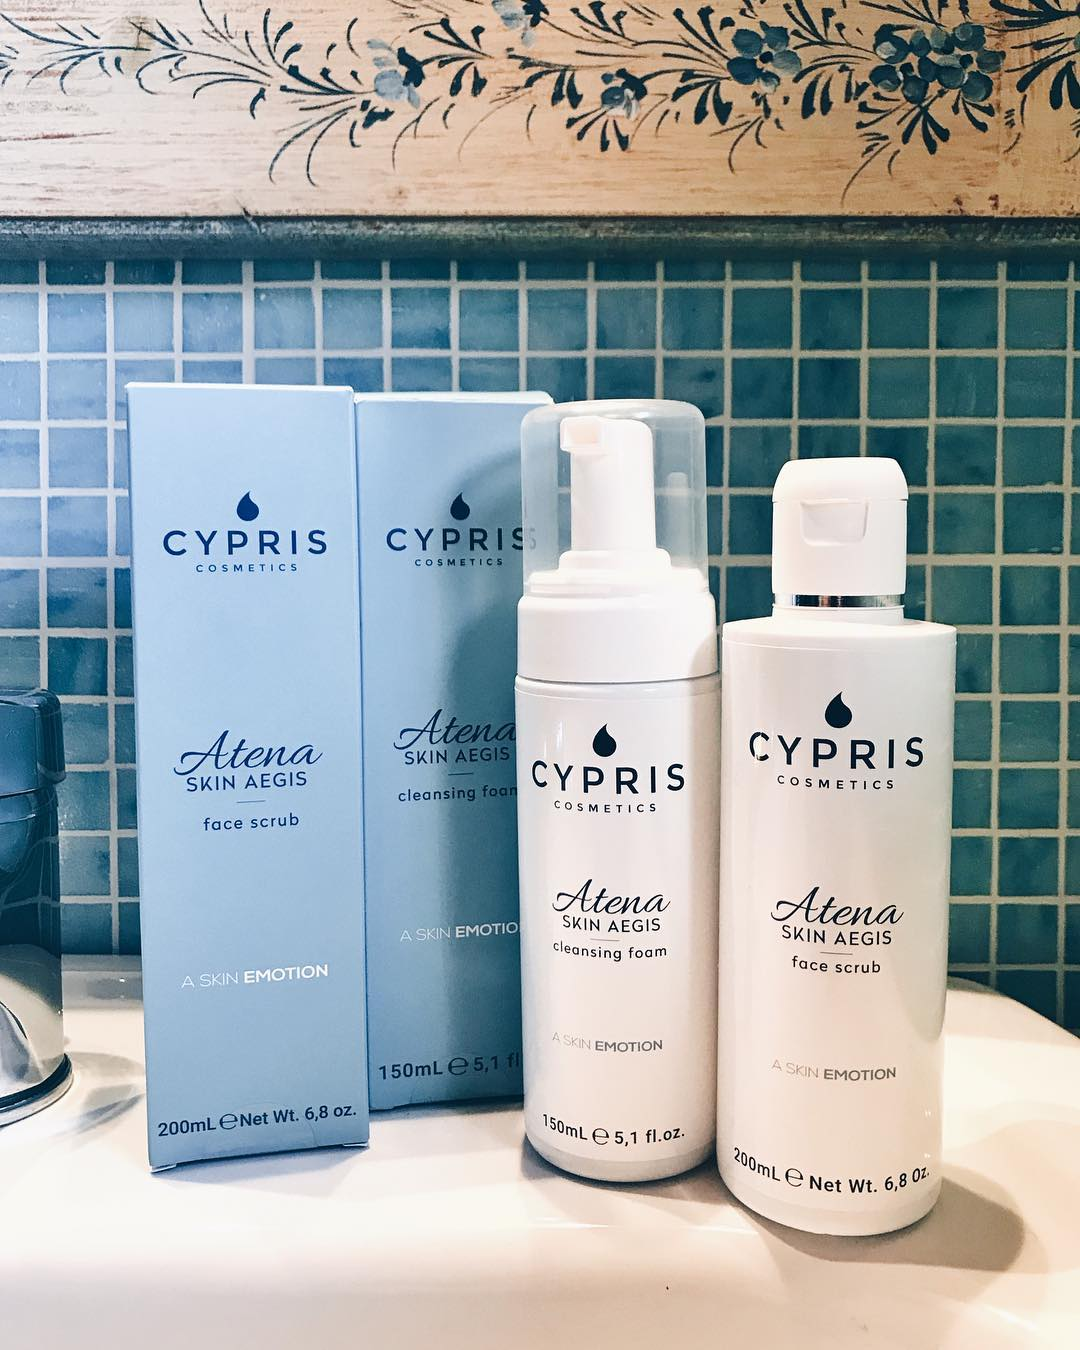 cypris-cosmetics-2